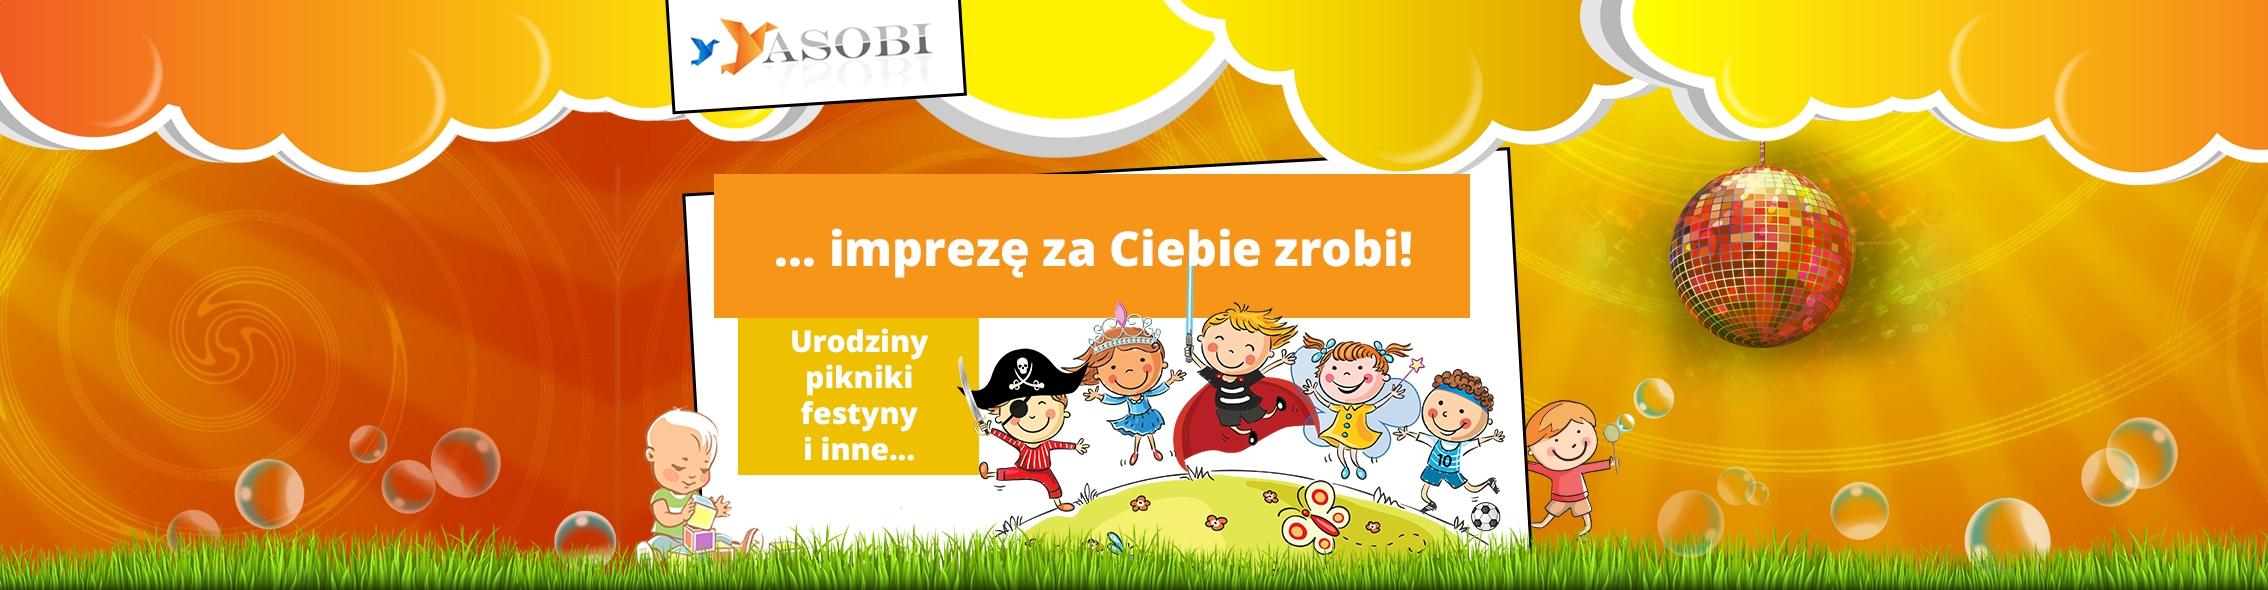 asobi_imprezy